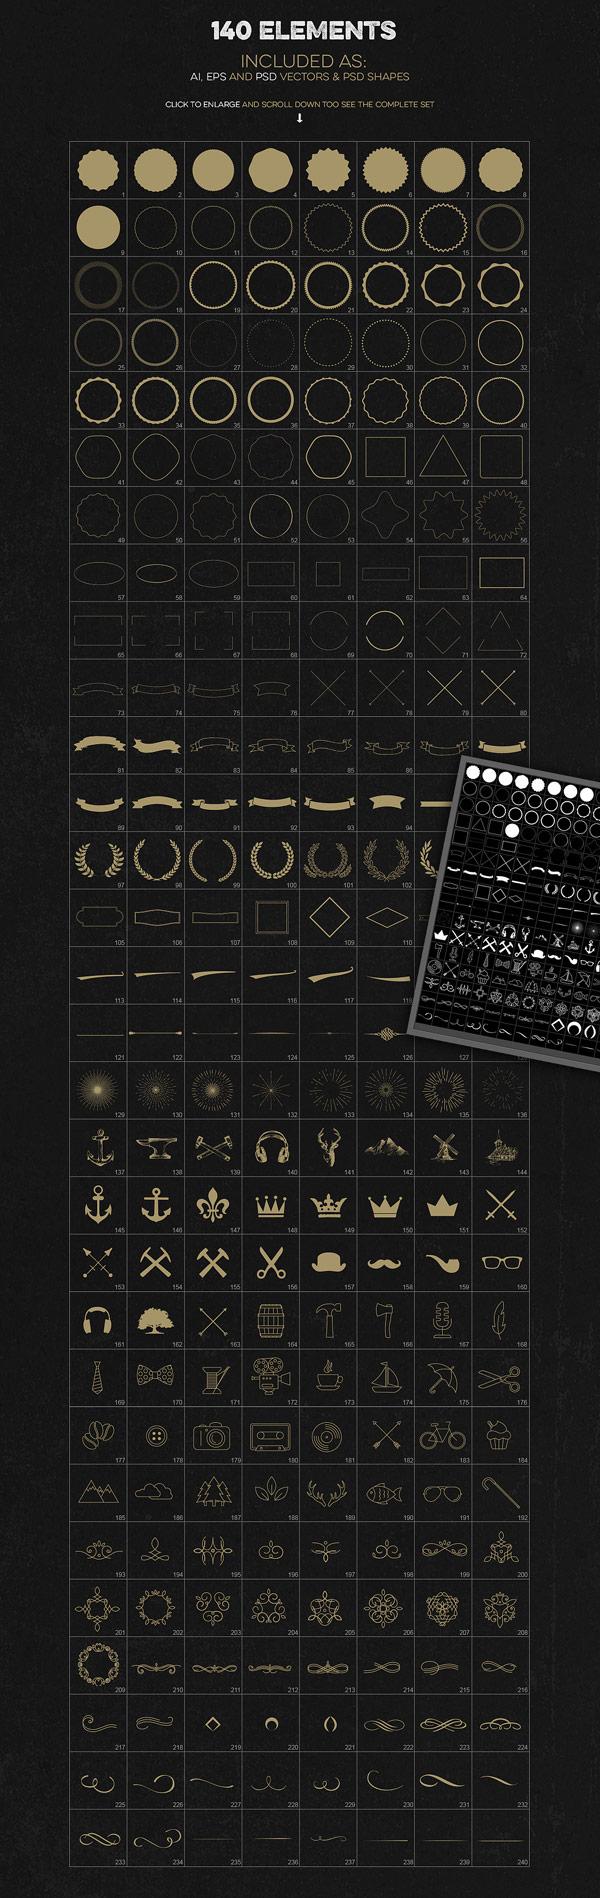 Logo Creation Kit from Zeppelin Graphics